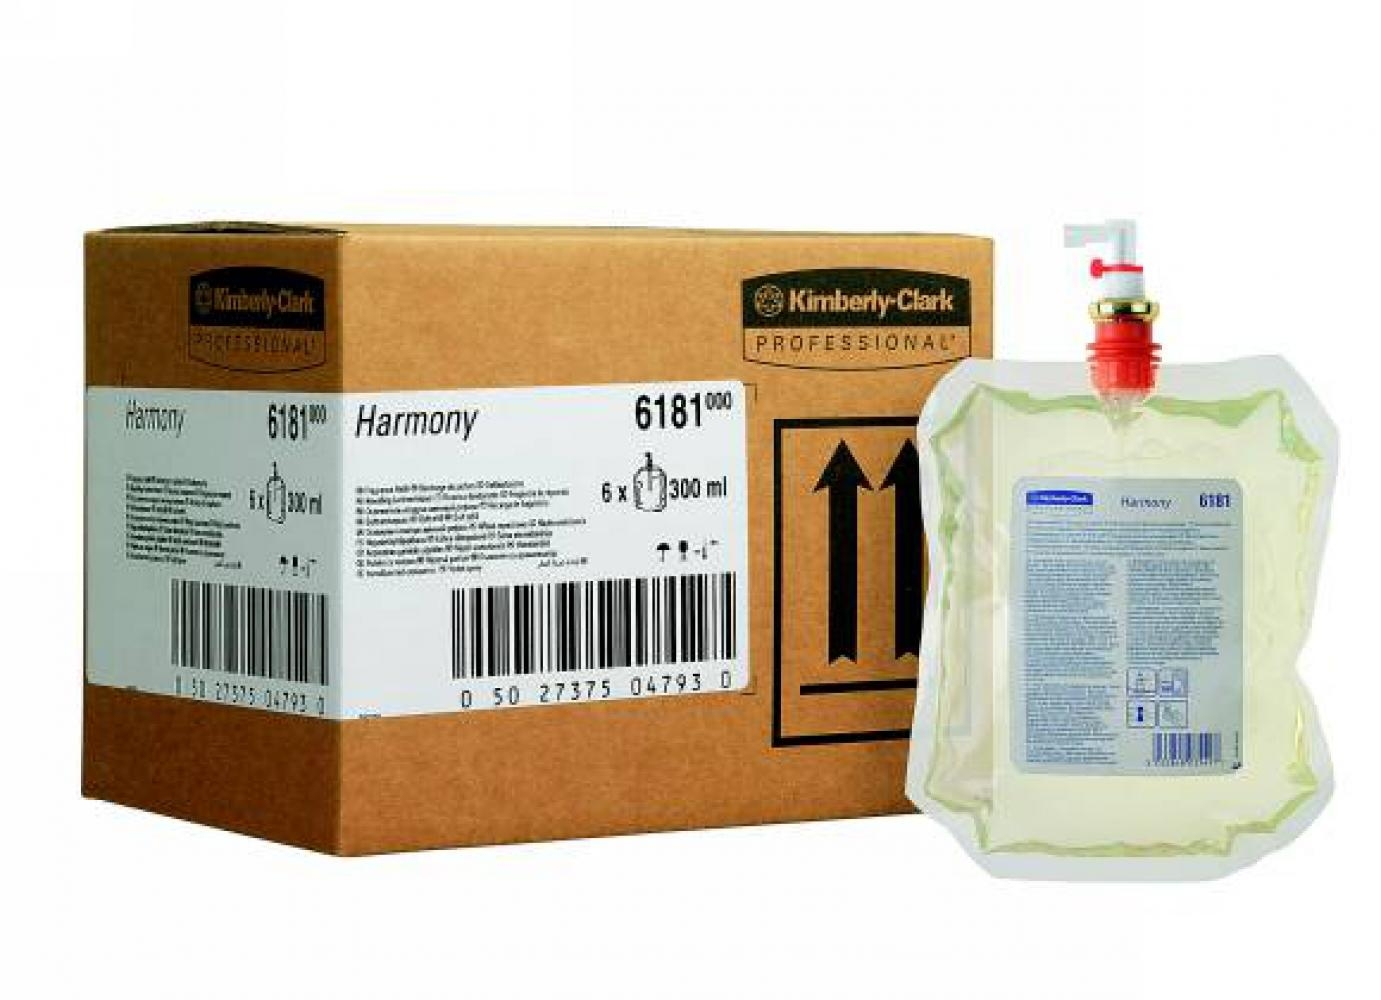 Acquista 6 Pezzi Deodoranti Profumazioni 17545650 | Glooke.com